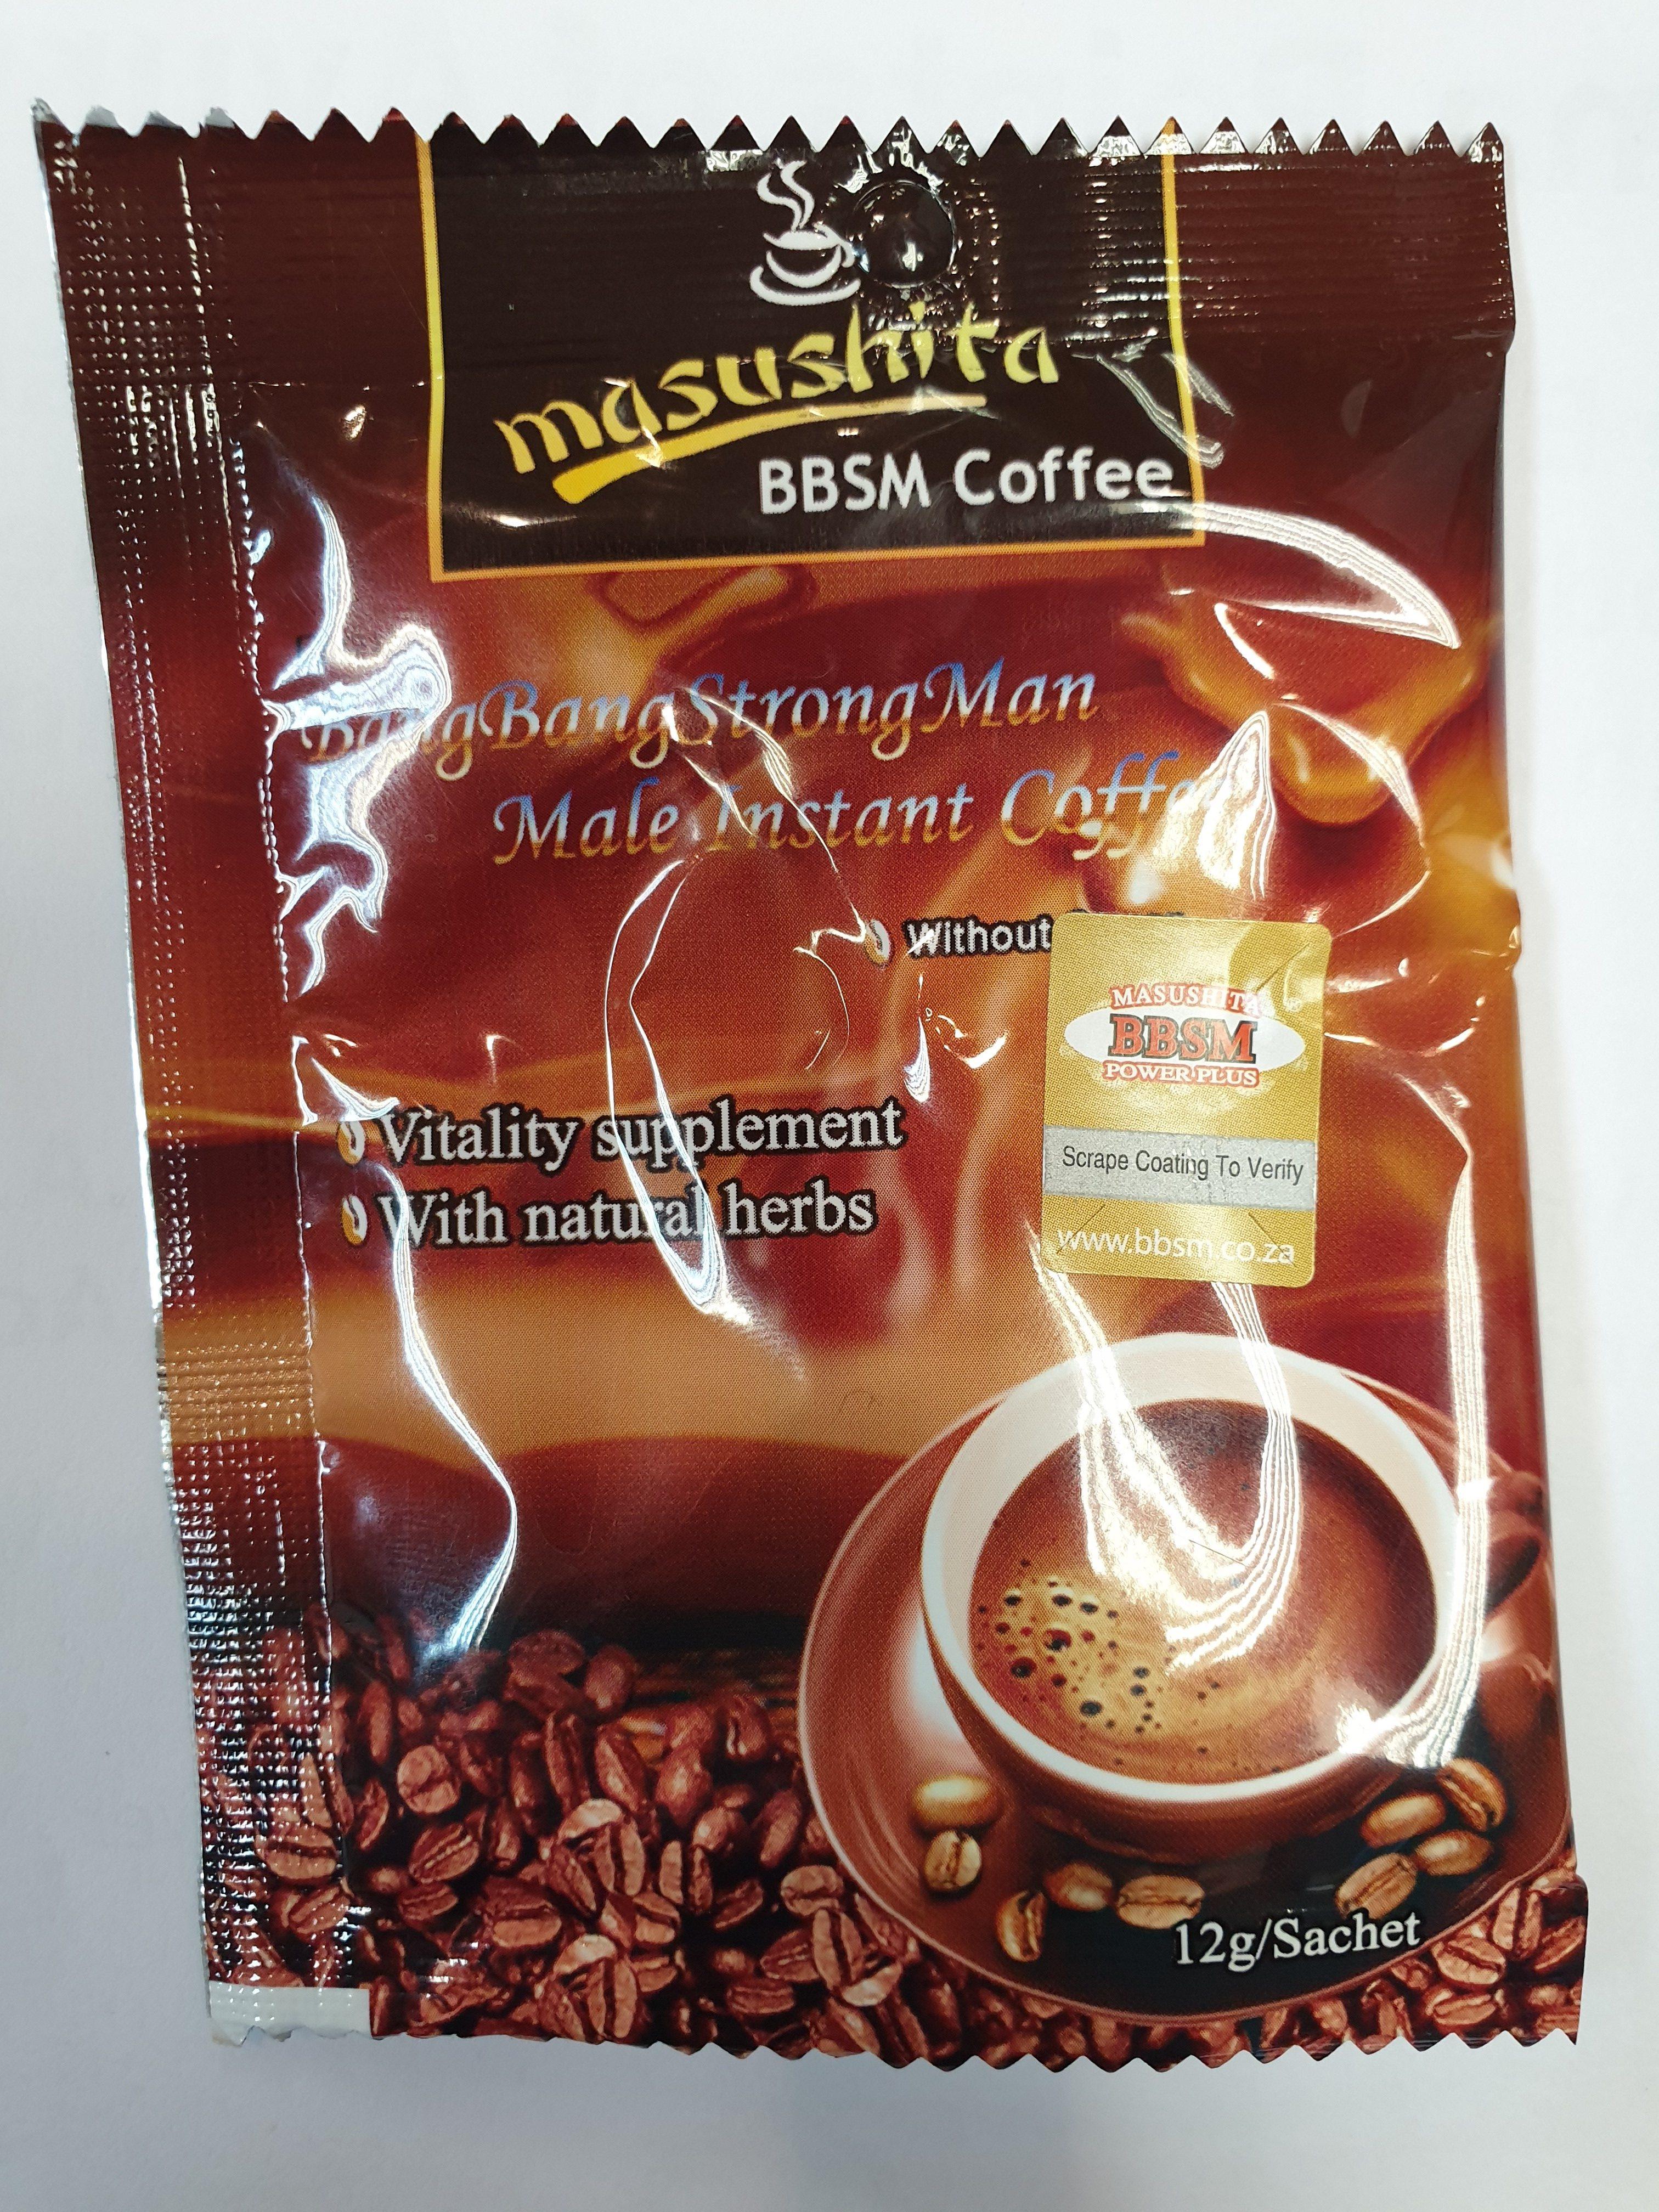 Masushita BBSM Coffee